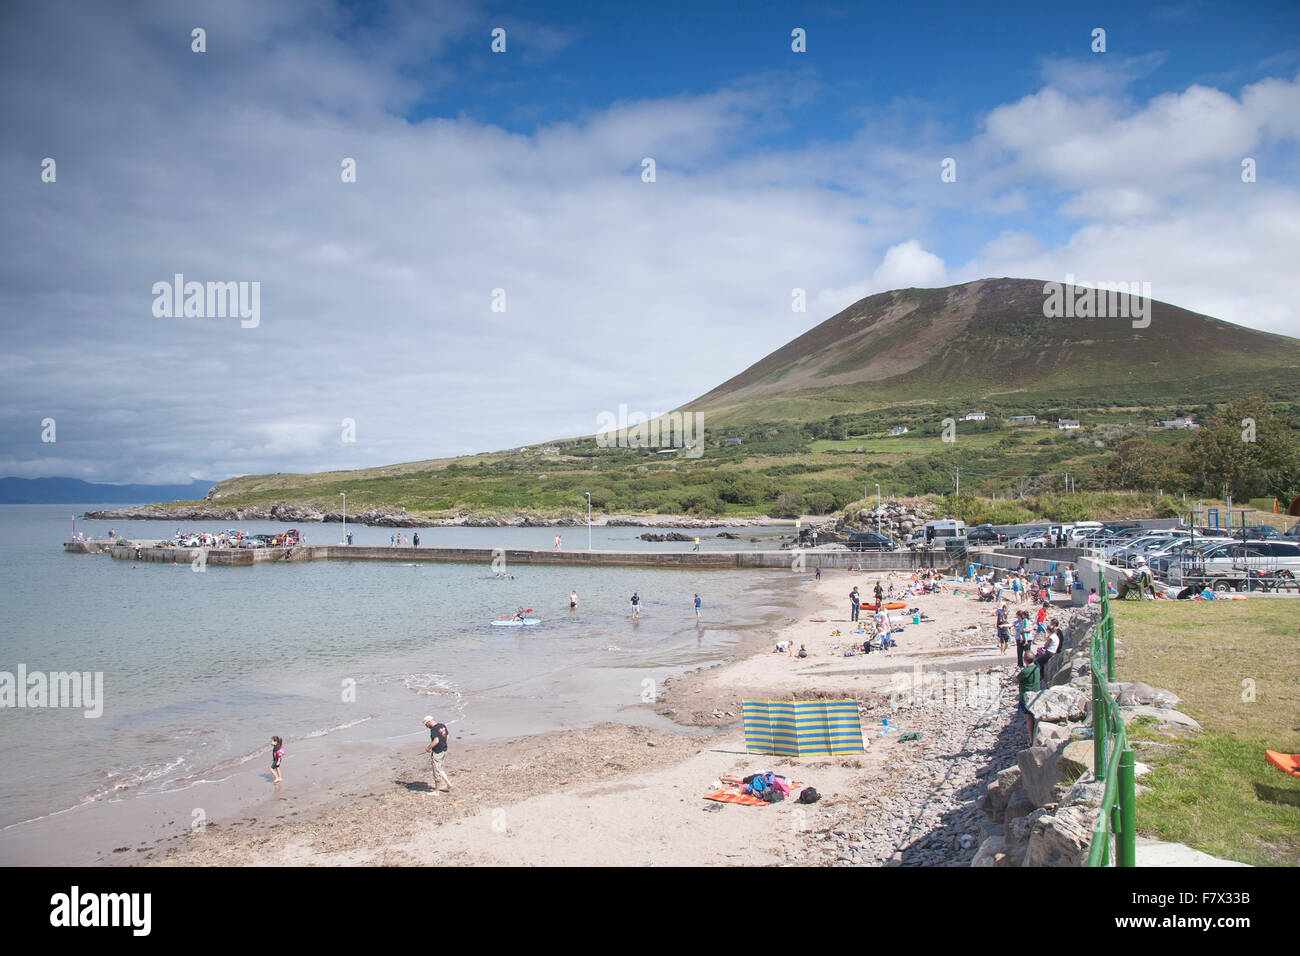 Kells Beach | County Kerry | UK & Ireland Beaches